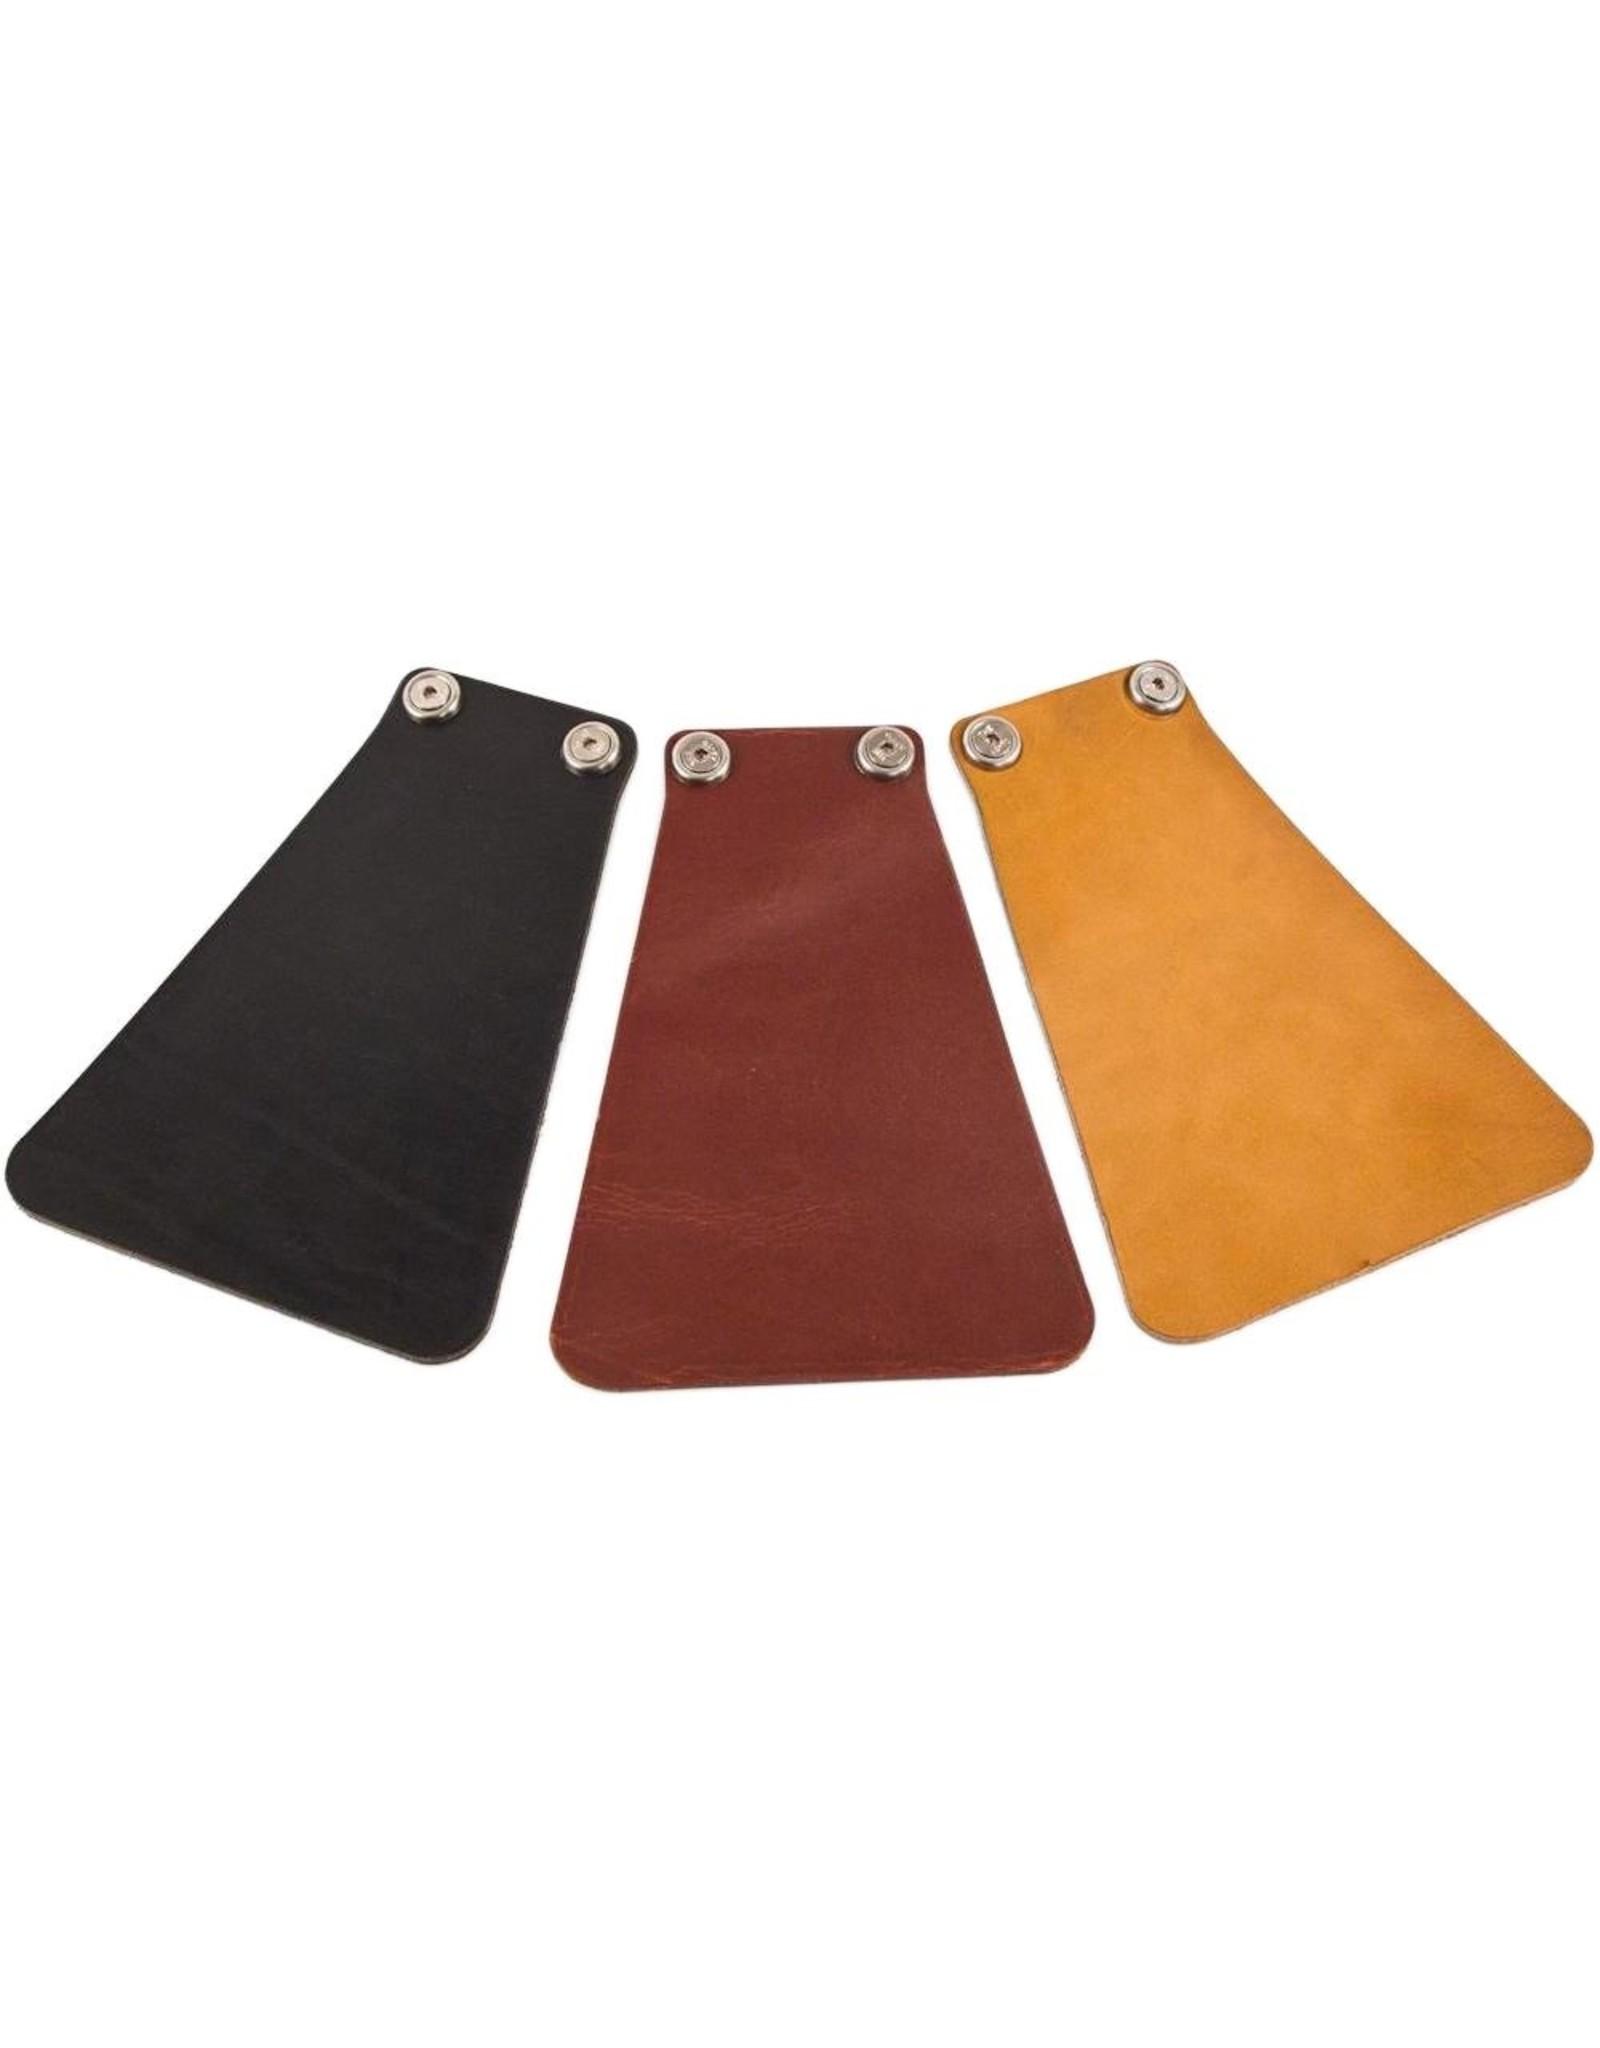 Velo Orange Fender Flaps